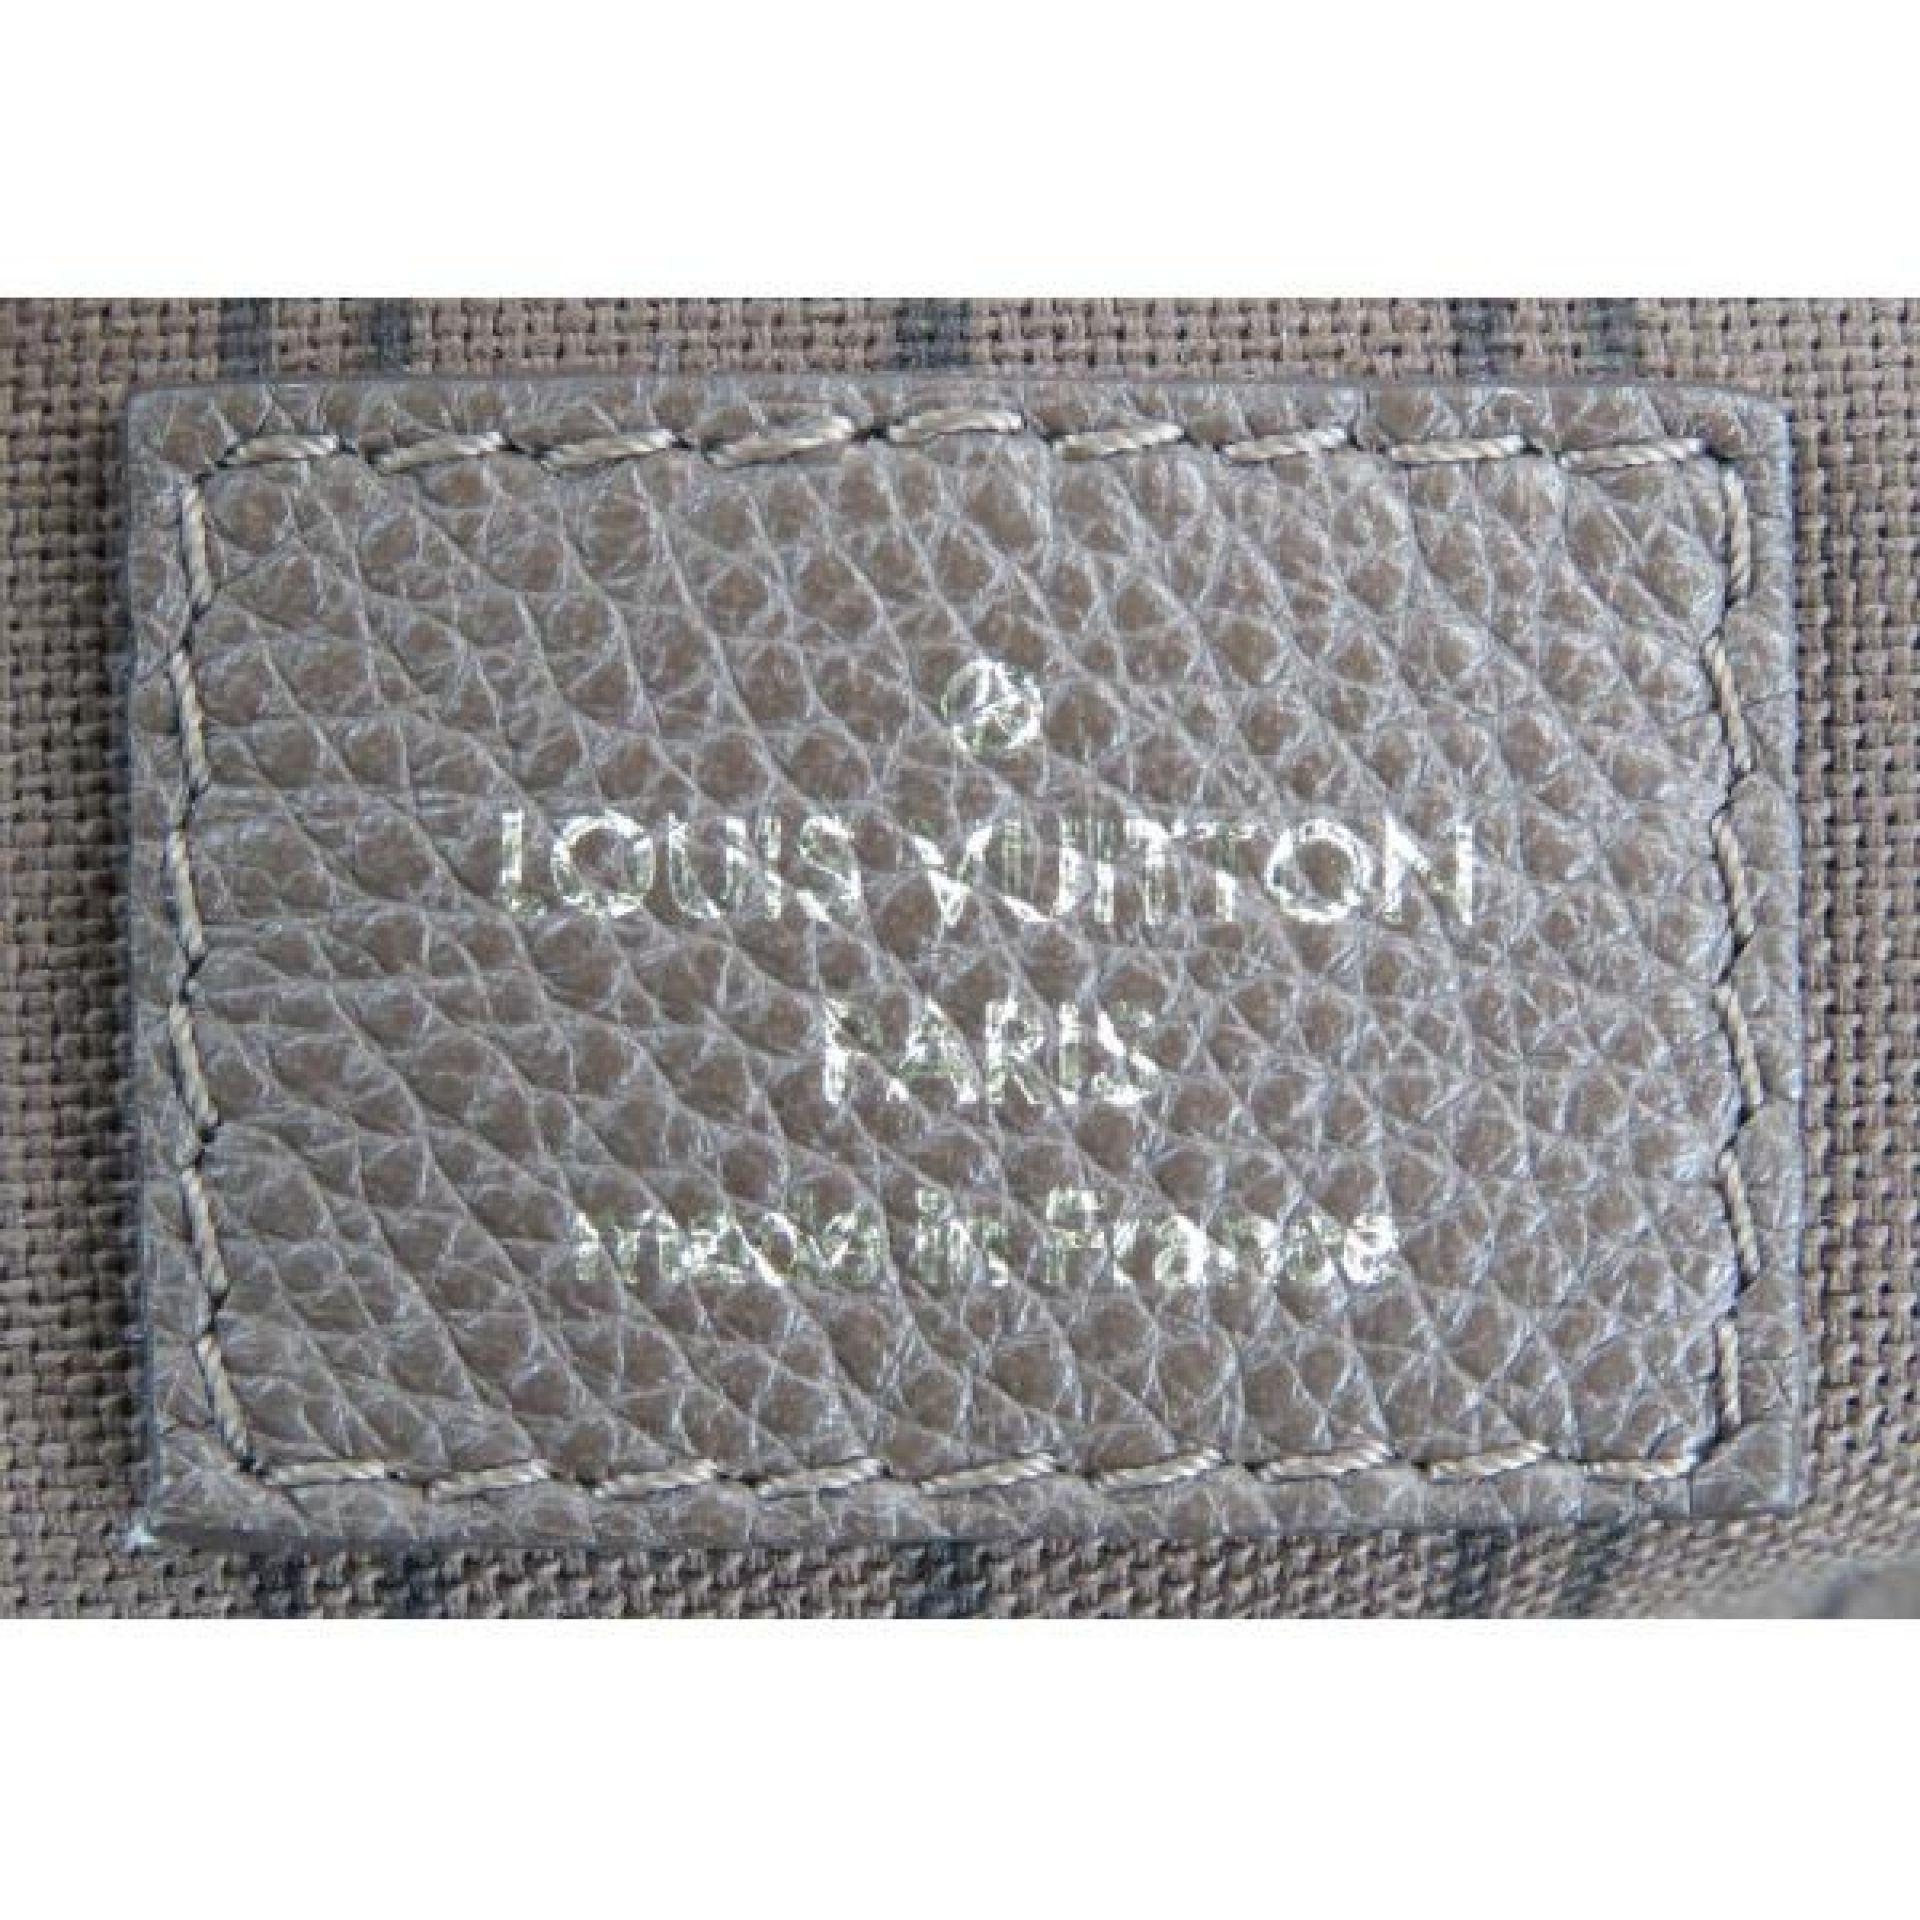 Louis Vuitton Taupe Ombre Monogram Empreinte Leather Lumineuse PM Bag